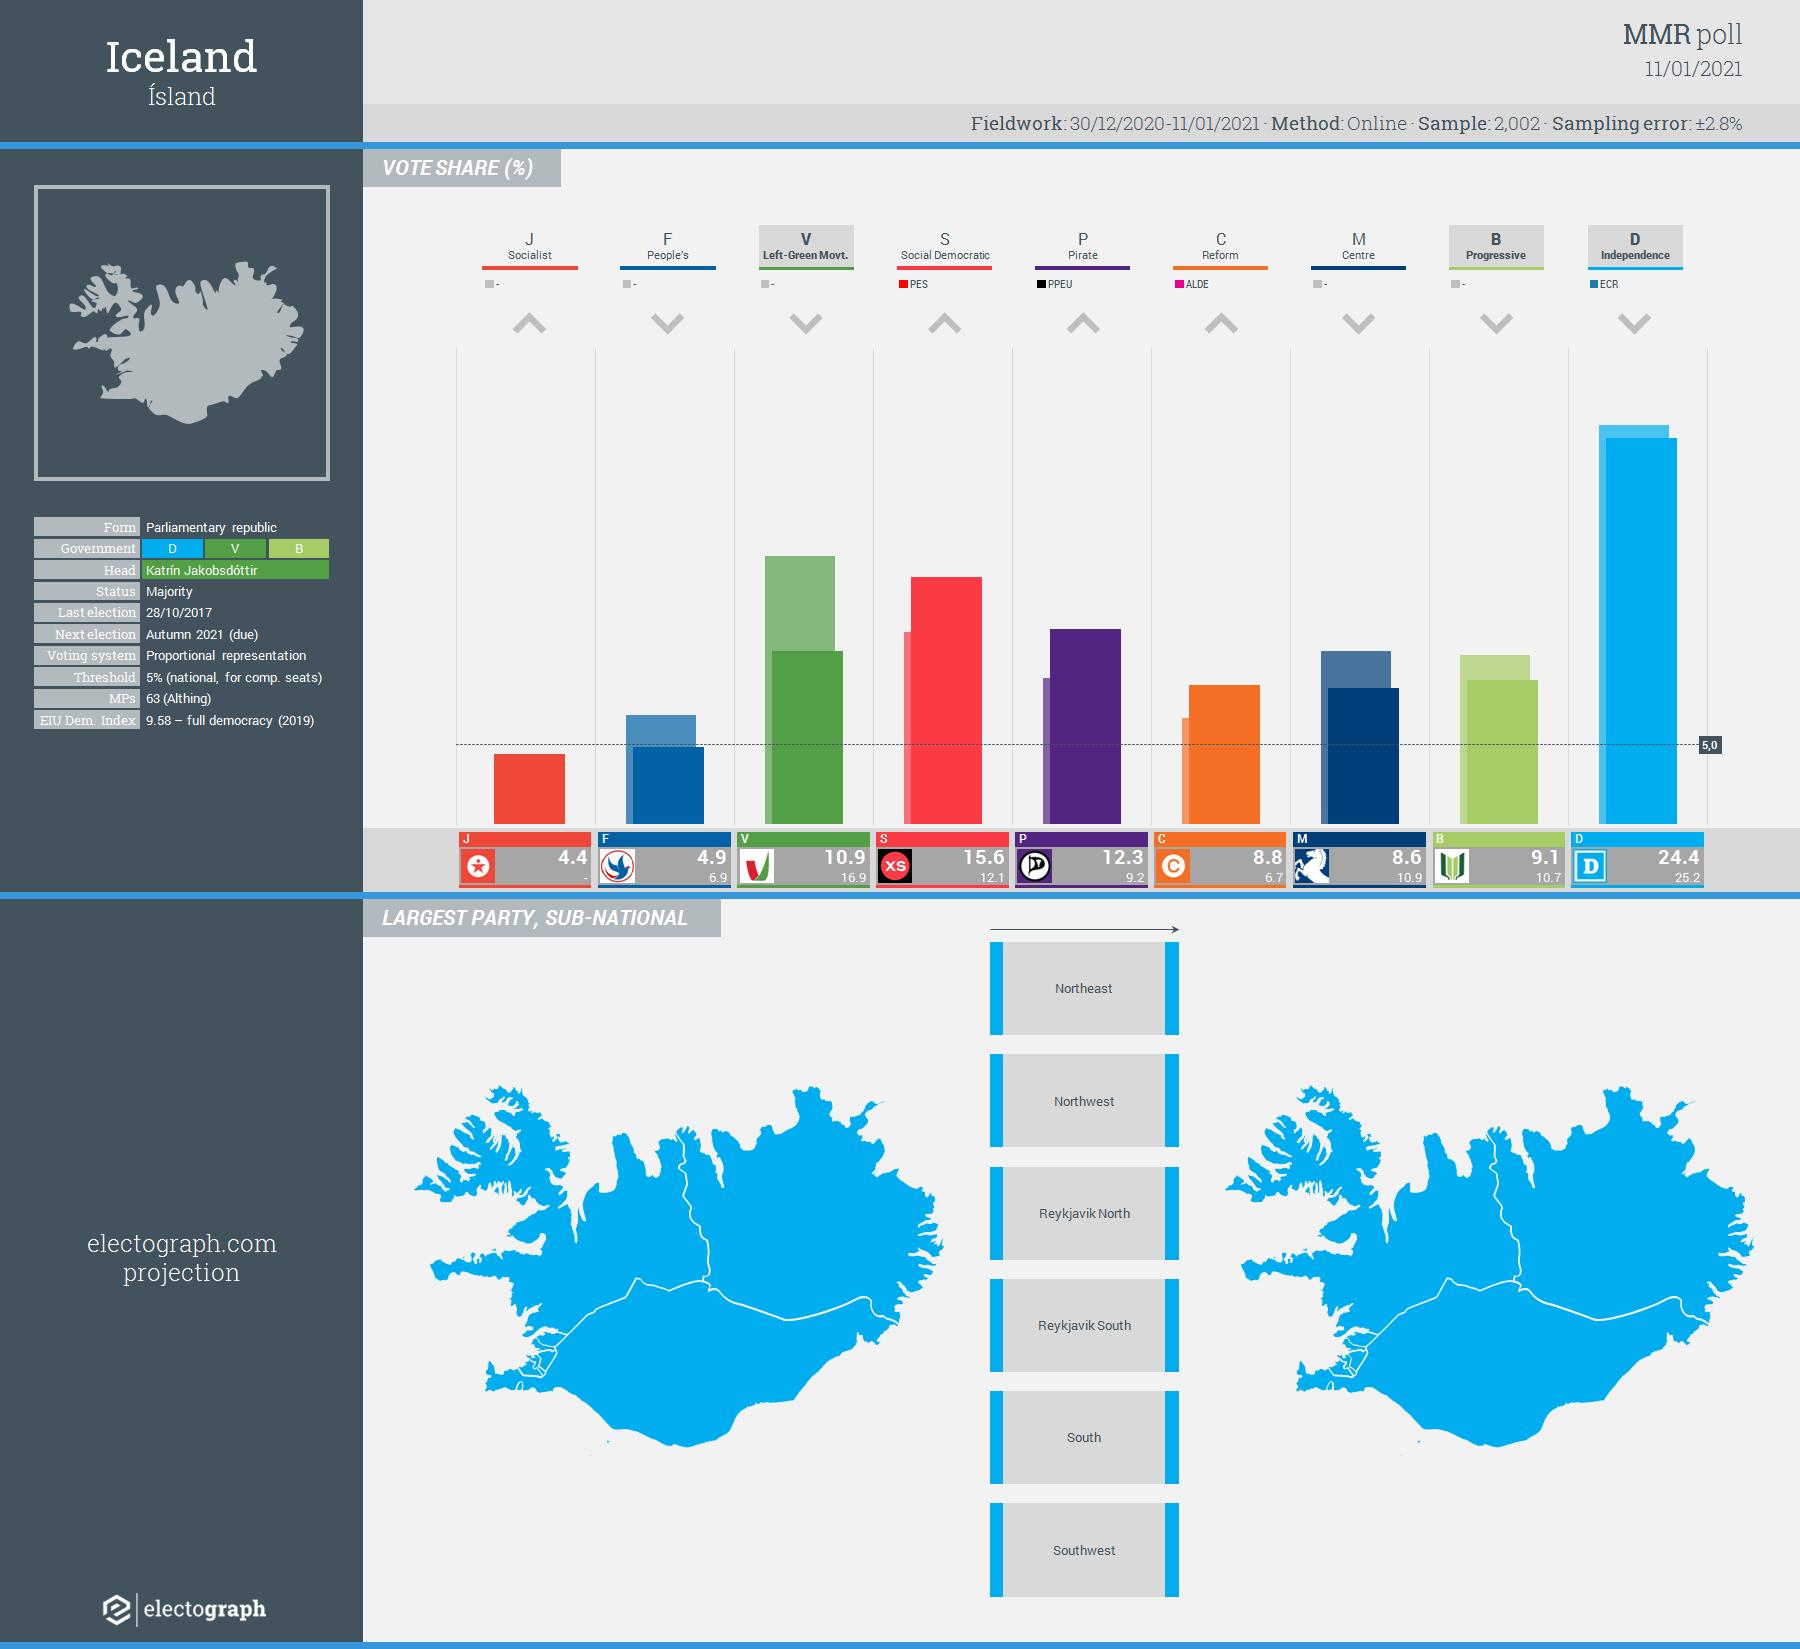 ICELAND: MMR poll chart, 11 January 2021